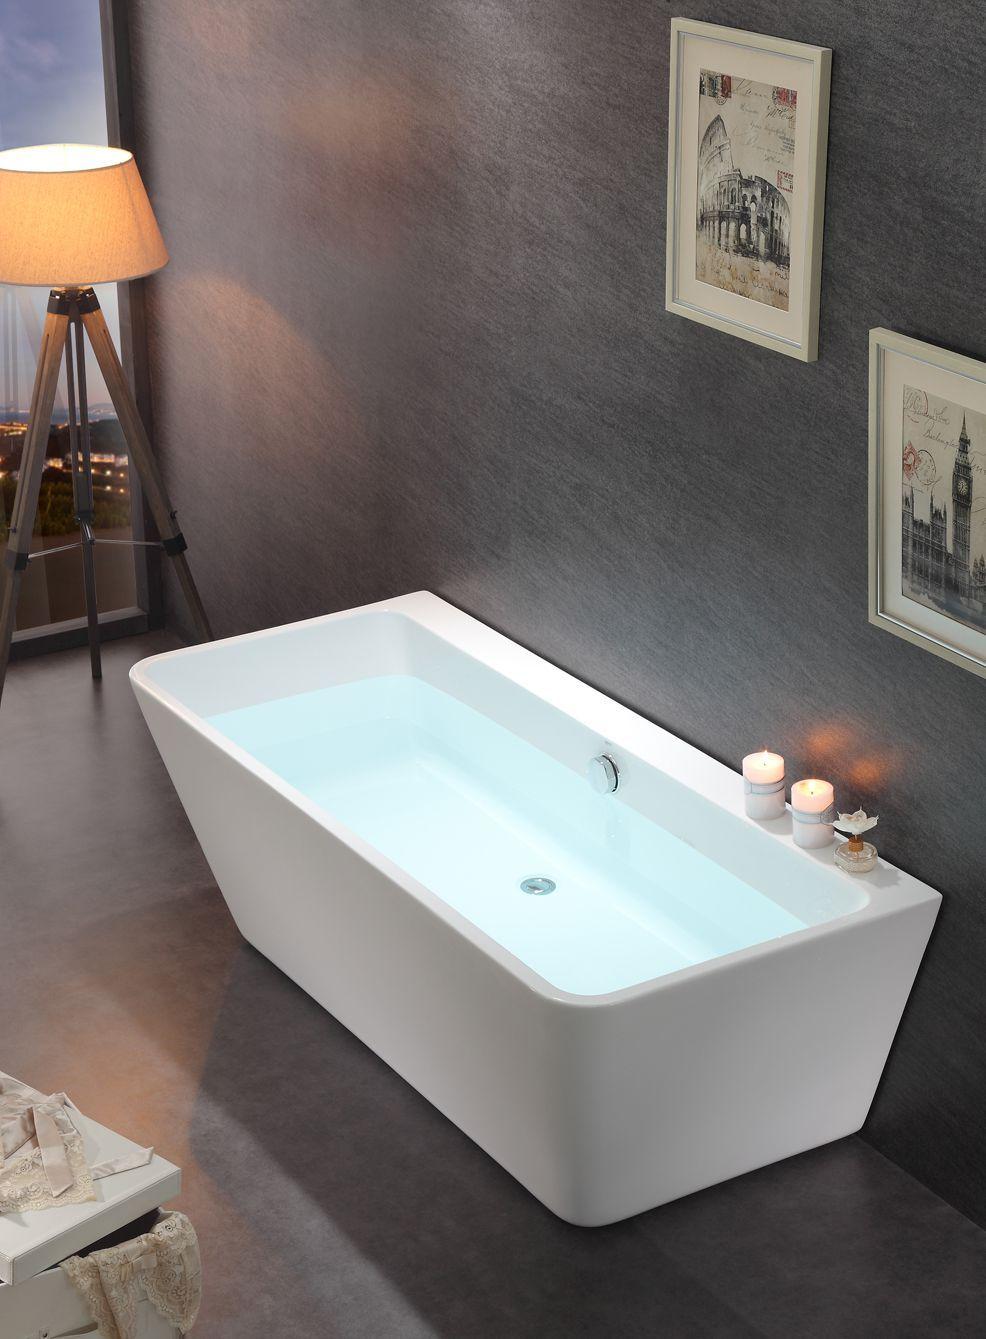 Bathroom designs with freestanding baths - Alpha Camden Btw Freestanding Bath This Stunning Back To Wall Freestanding Bath Bring Luxury To The